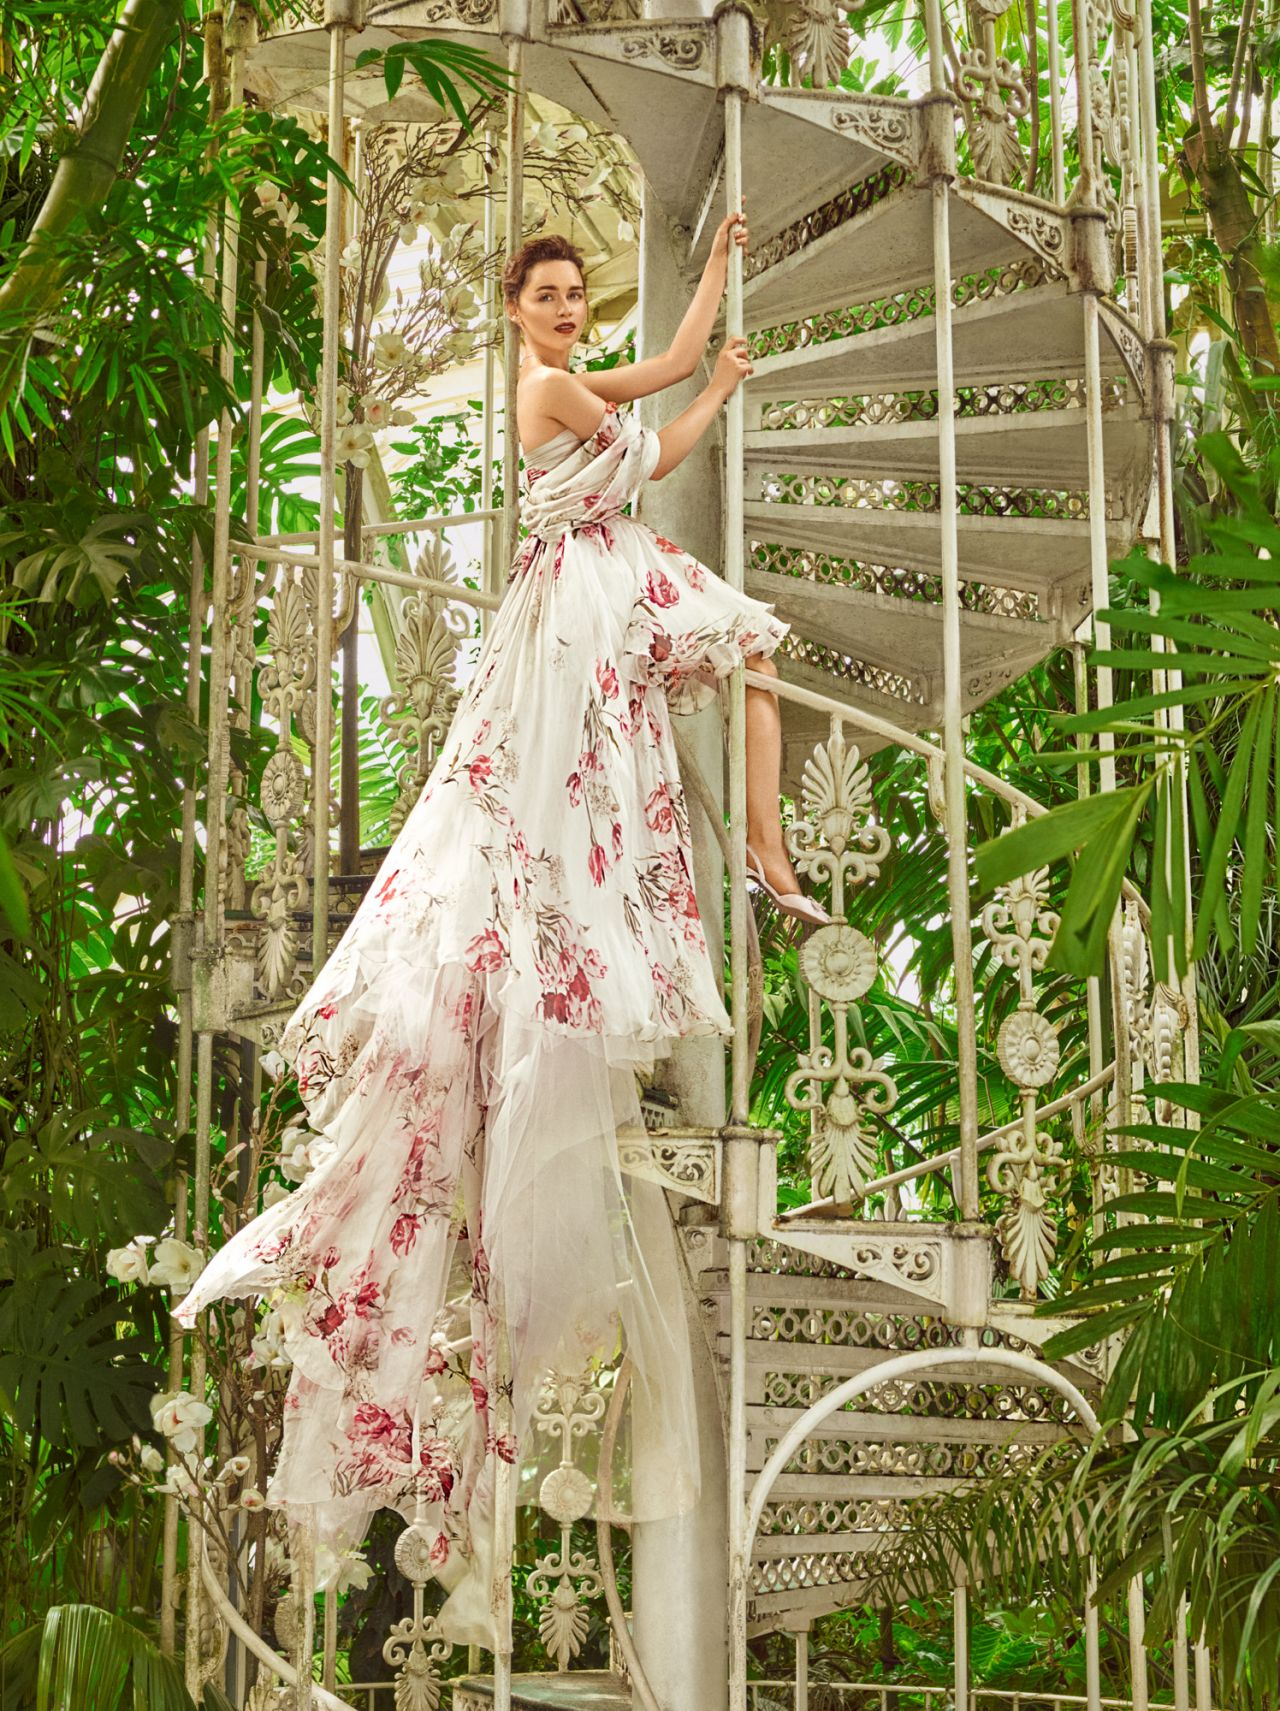 http://celebmafia.com/wp-content/uploads/2017/11/emilia-clarke-harper-s-bazaar-magazine-us-december-2017-january-2018-2.jpg